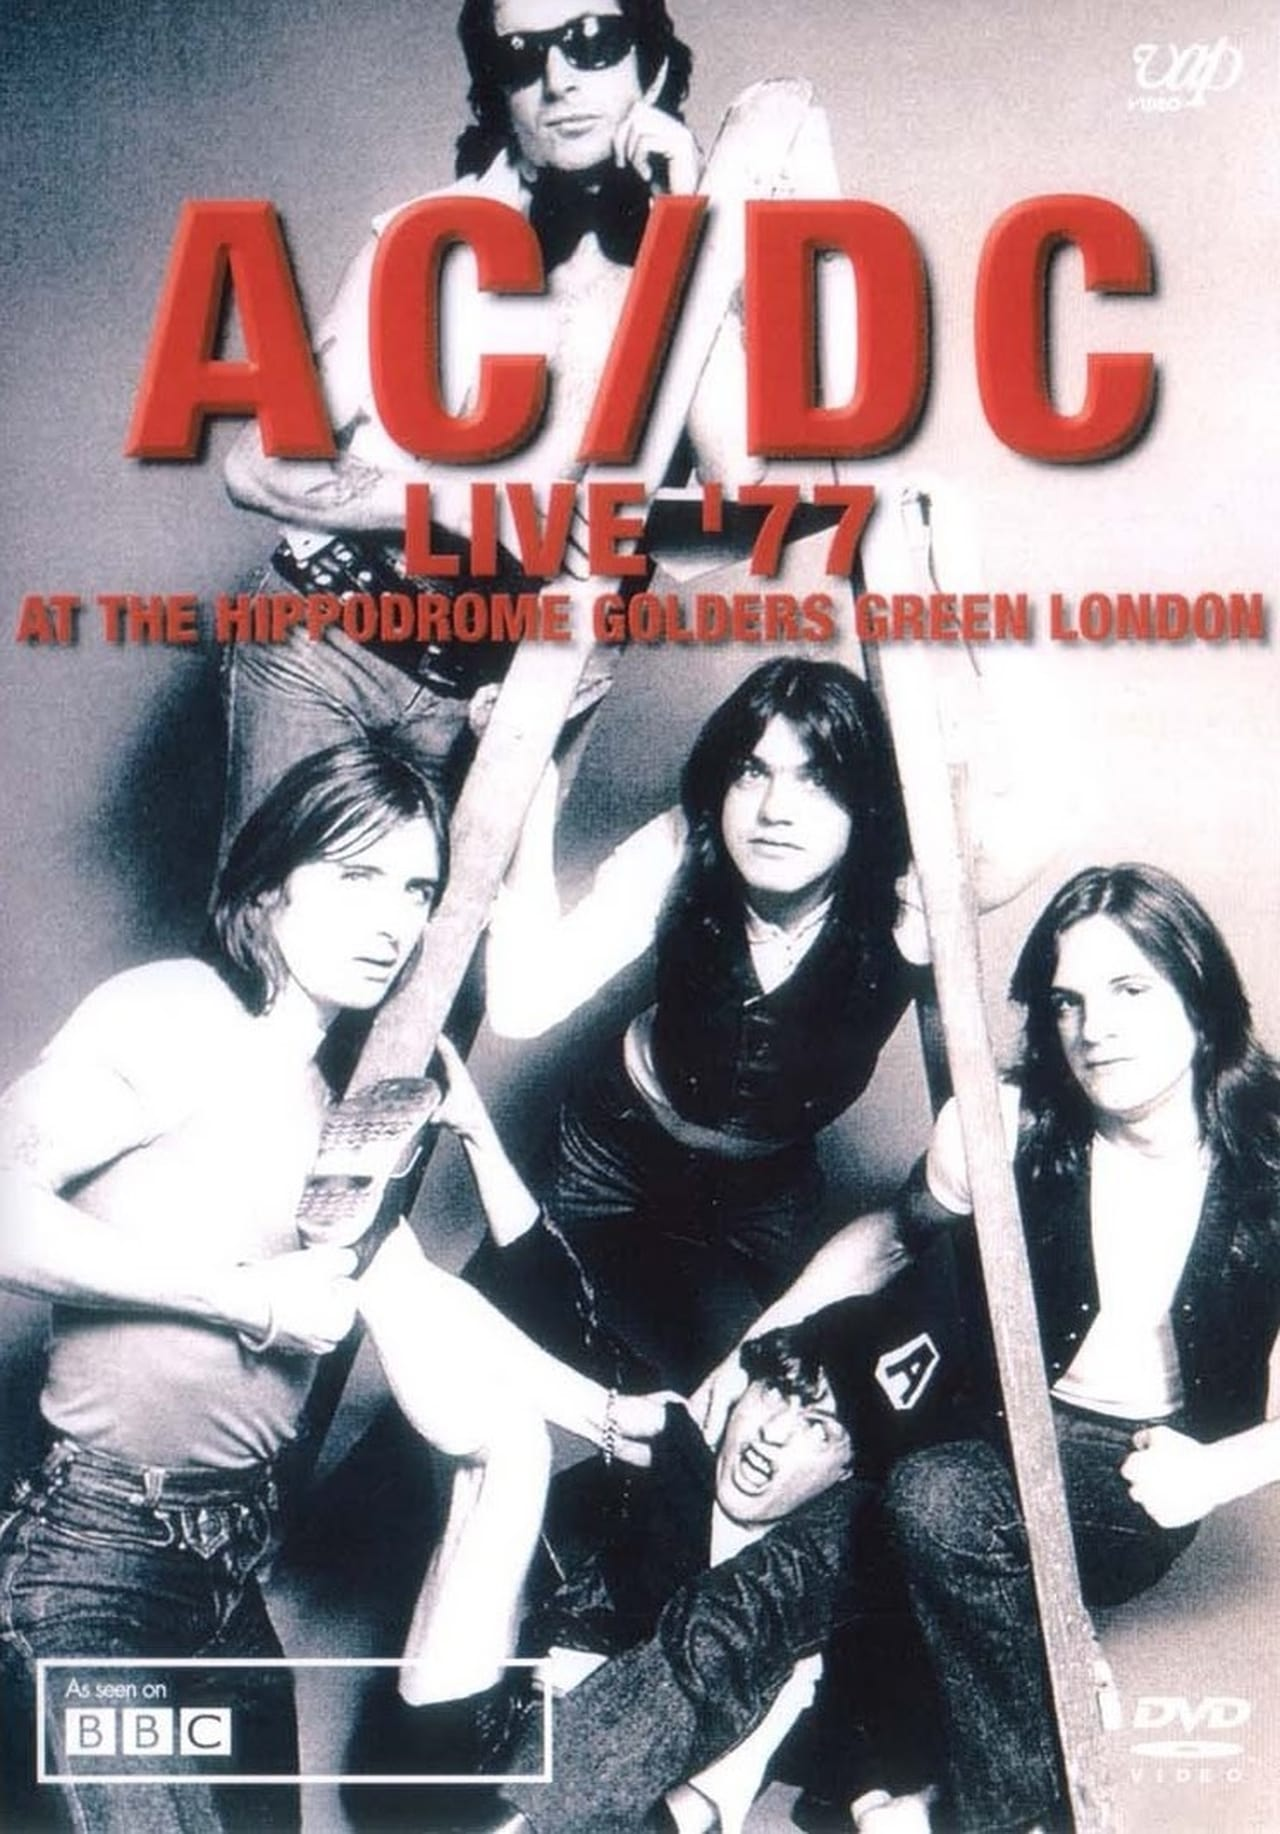 AC/DC Live '77